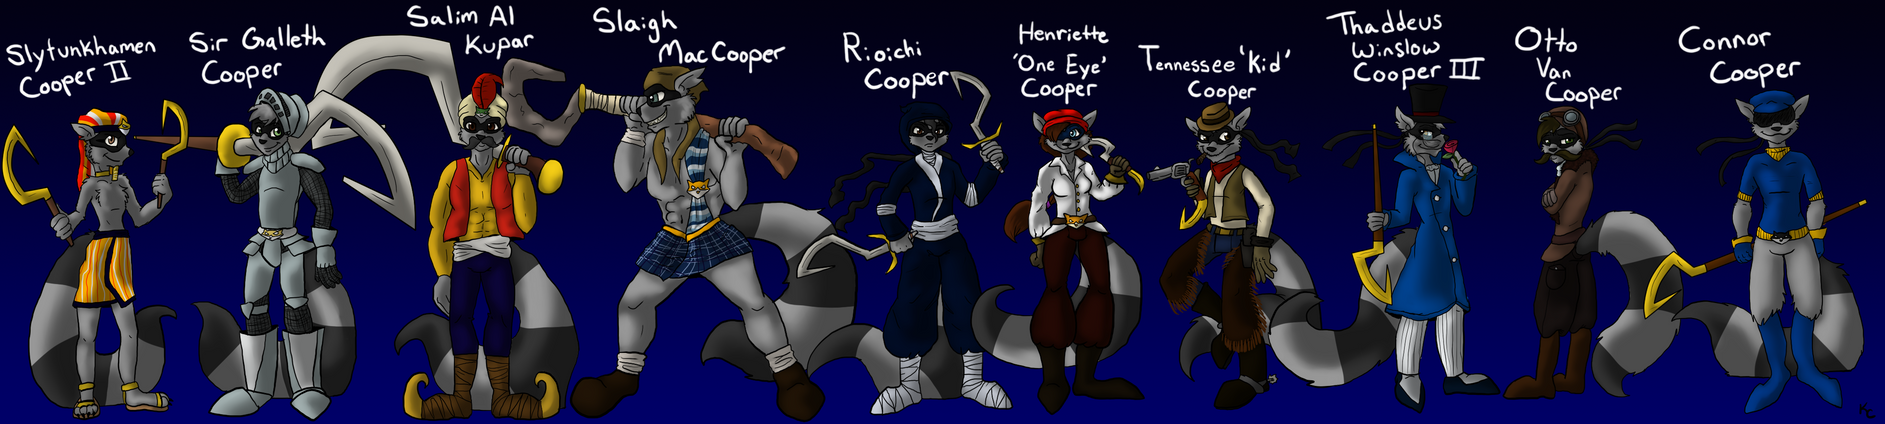 The Cooper Ancestors by SnookumsGal